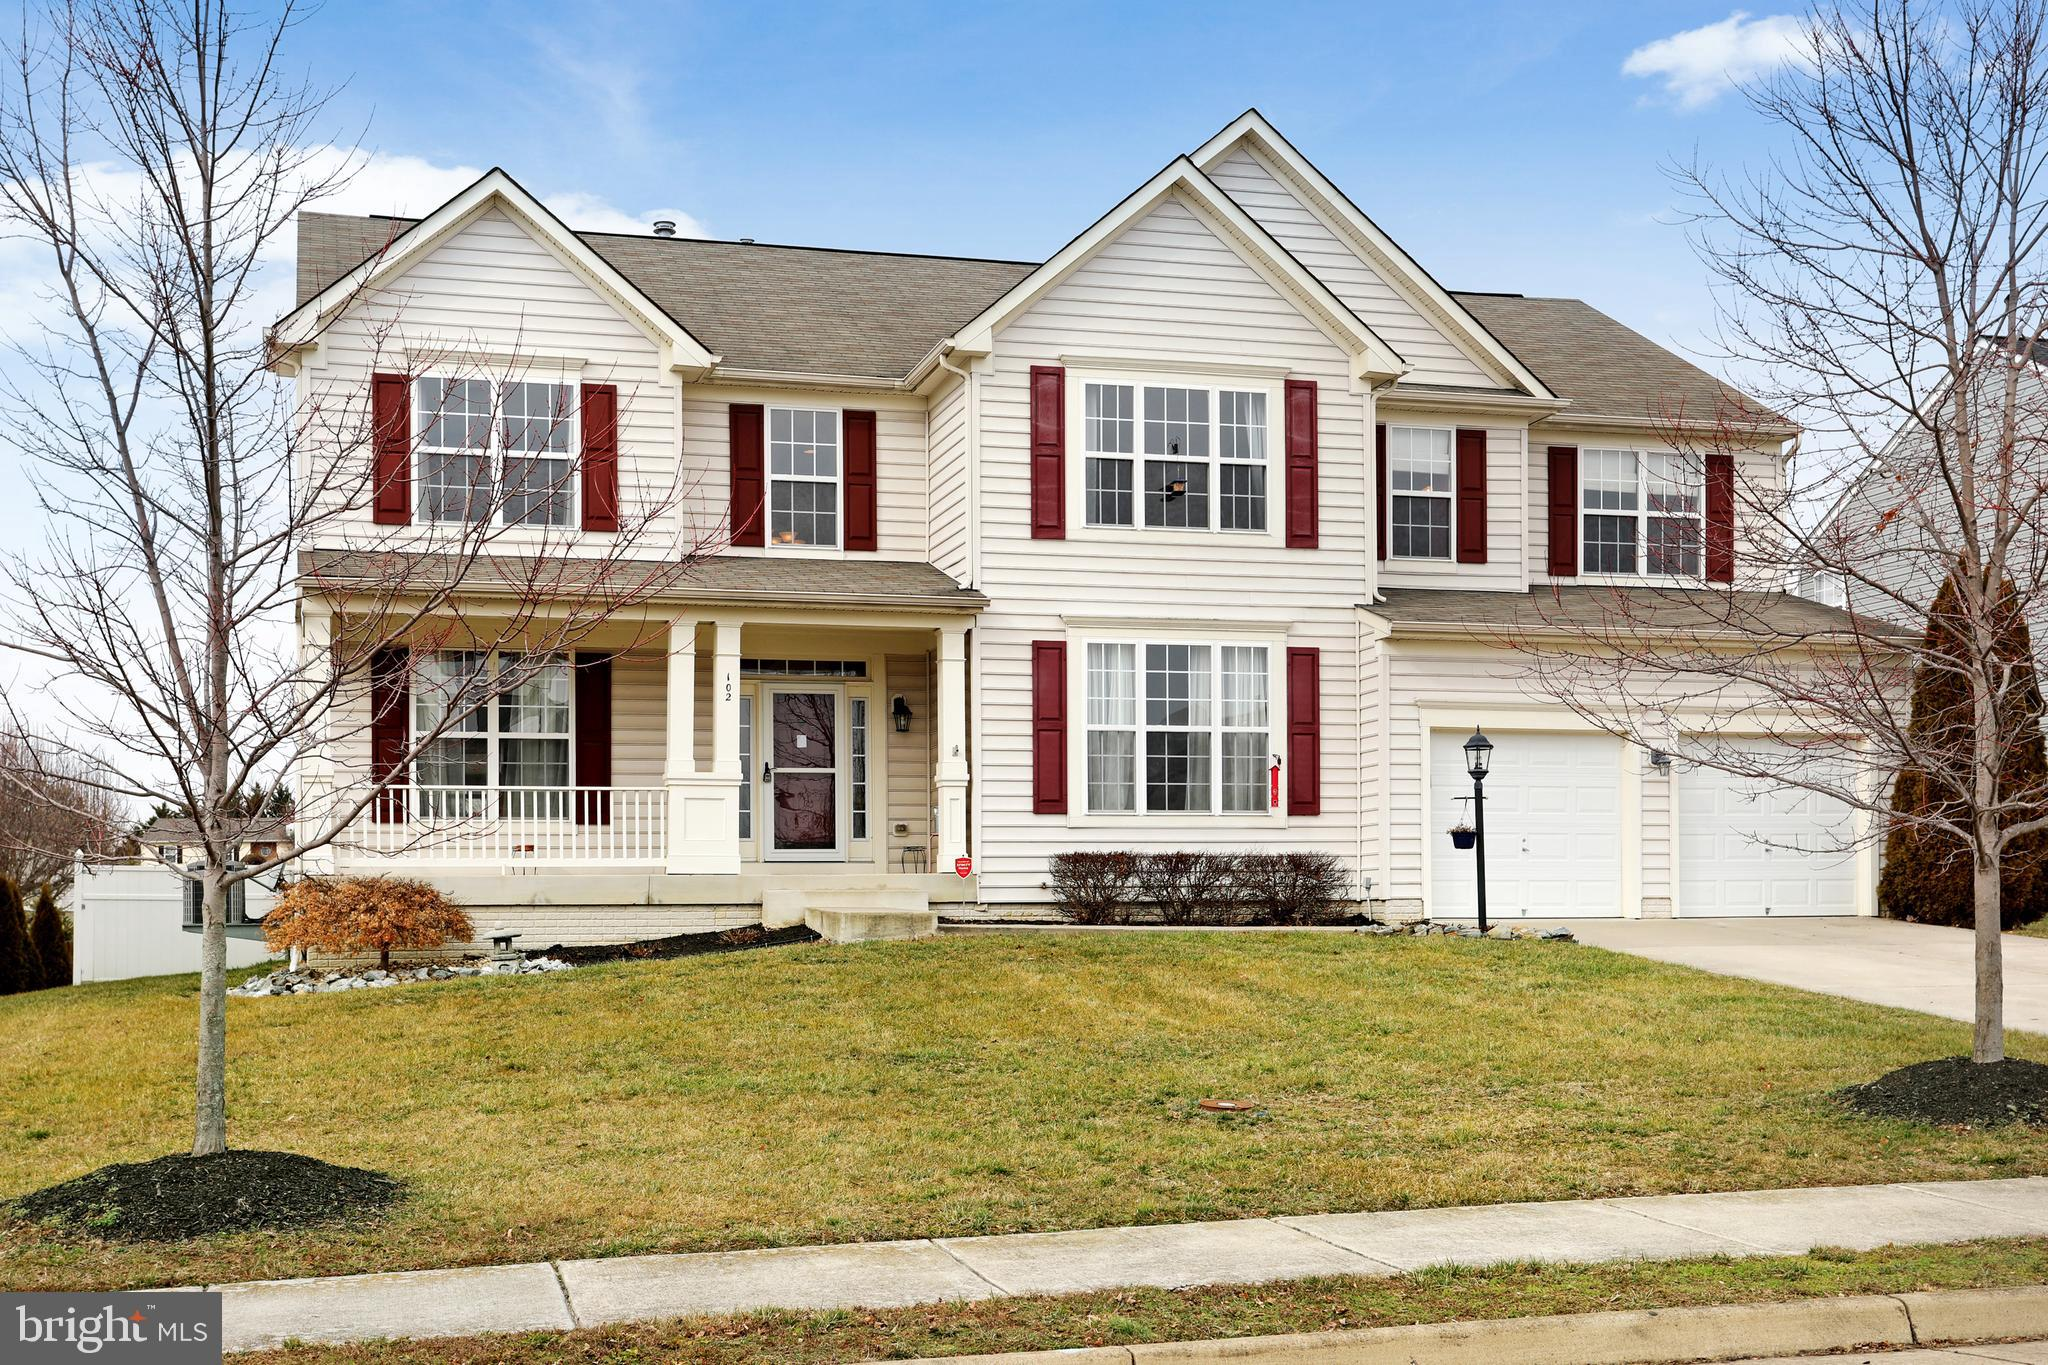 102 Marlise Ln, Winchester, VA, 22602